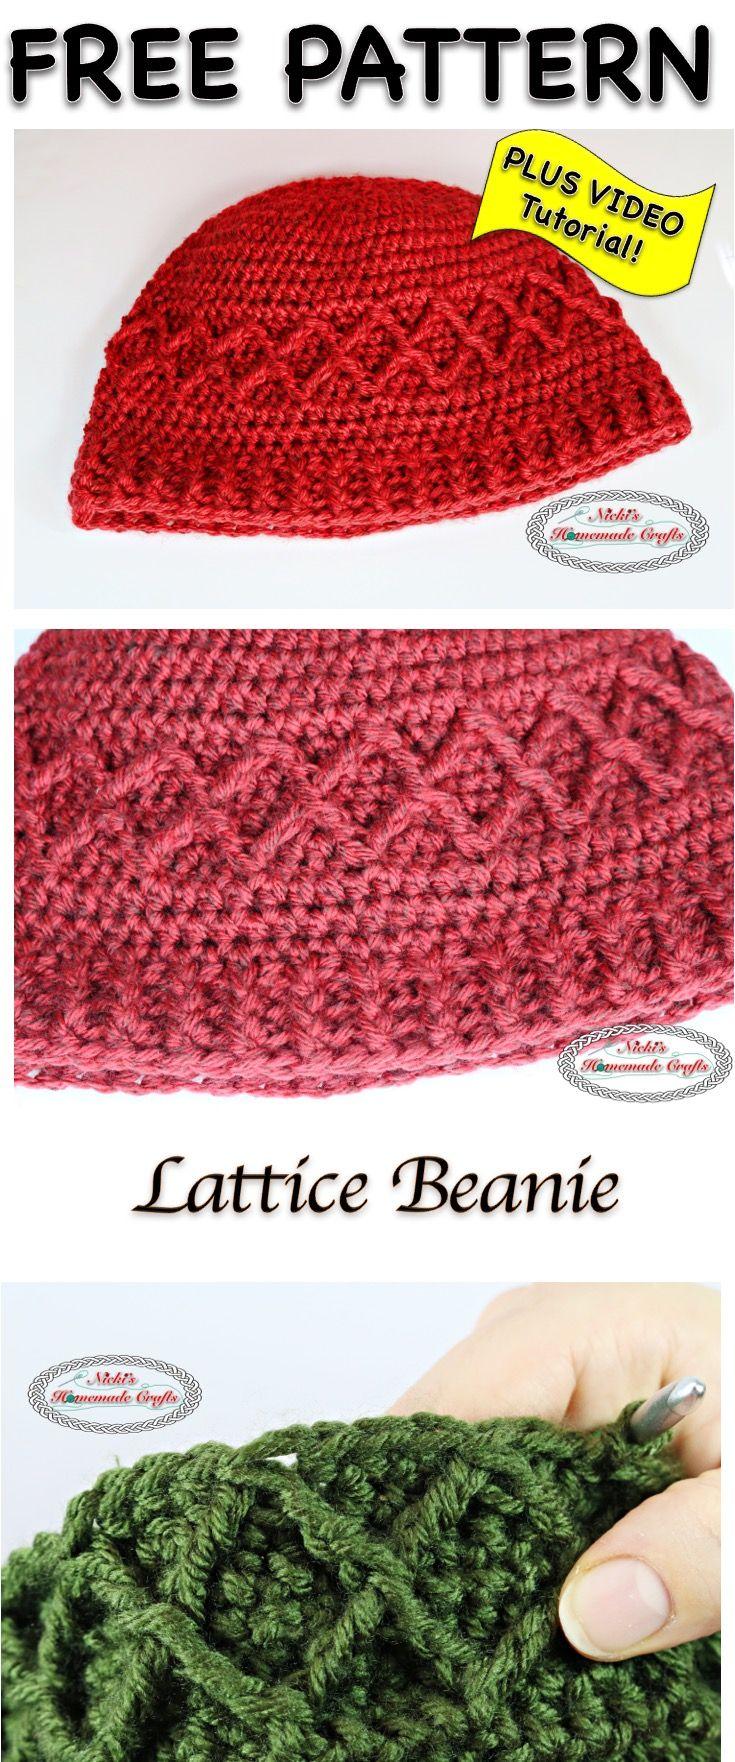 6d8aaf406e1 Lattice Beanie - Free Crochet Pattern by Nicki s Homemade Crafts  crochet   beanie  lattice